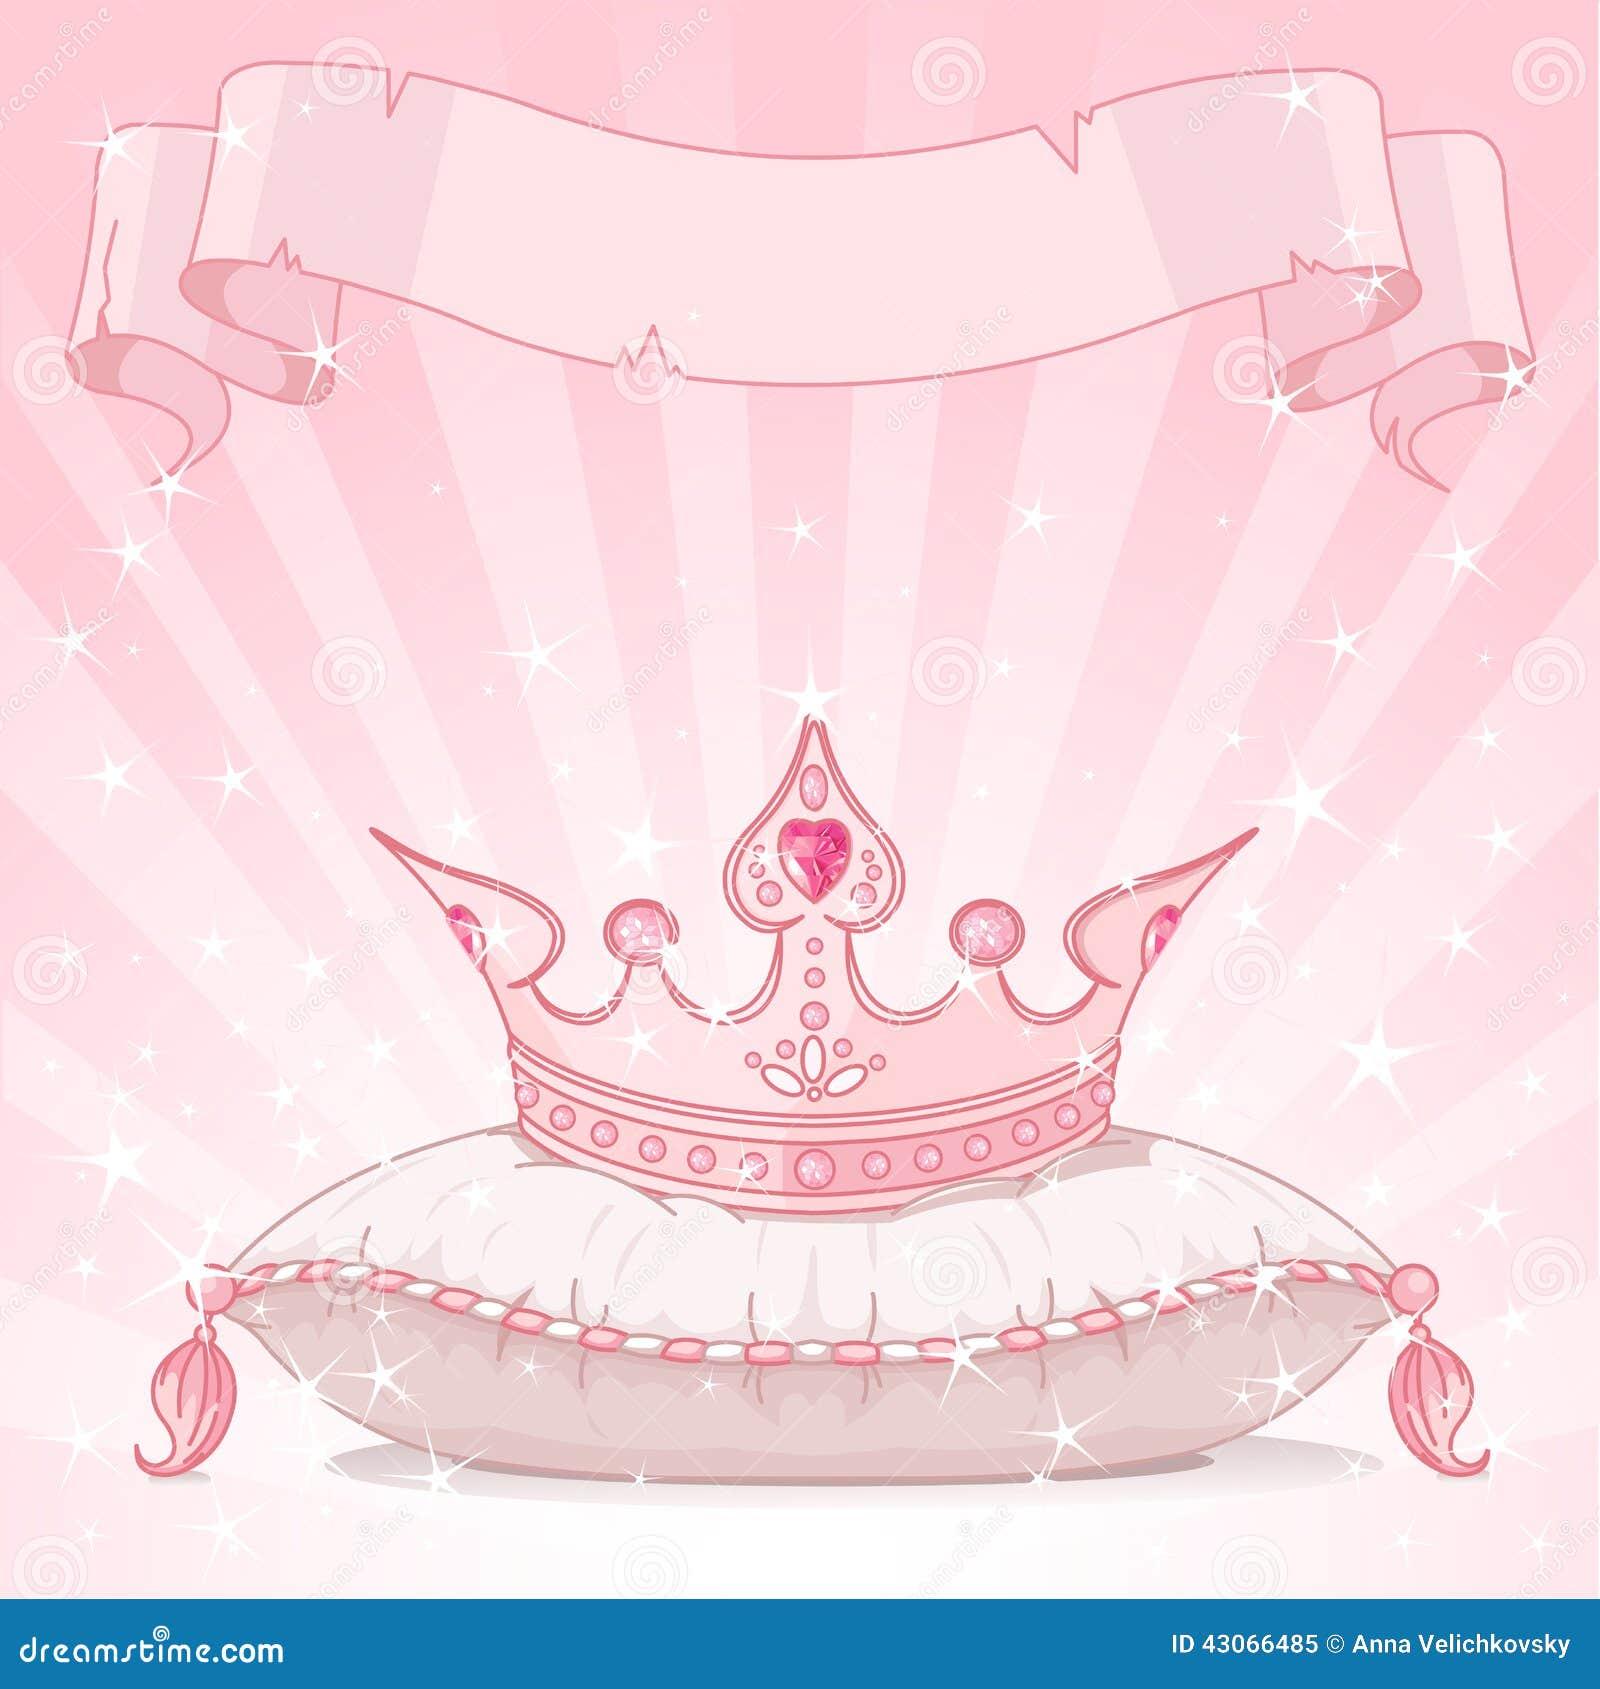 Disney Princess Party Invitations is beautiful invitations layout